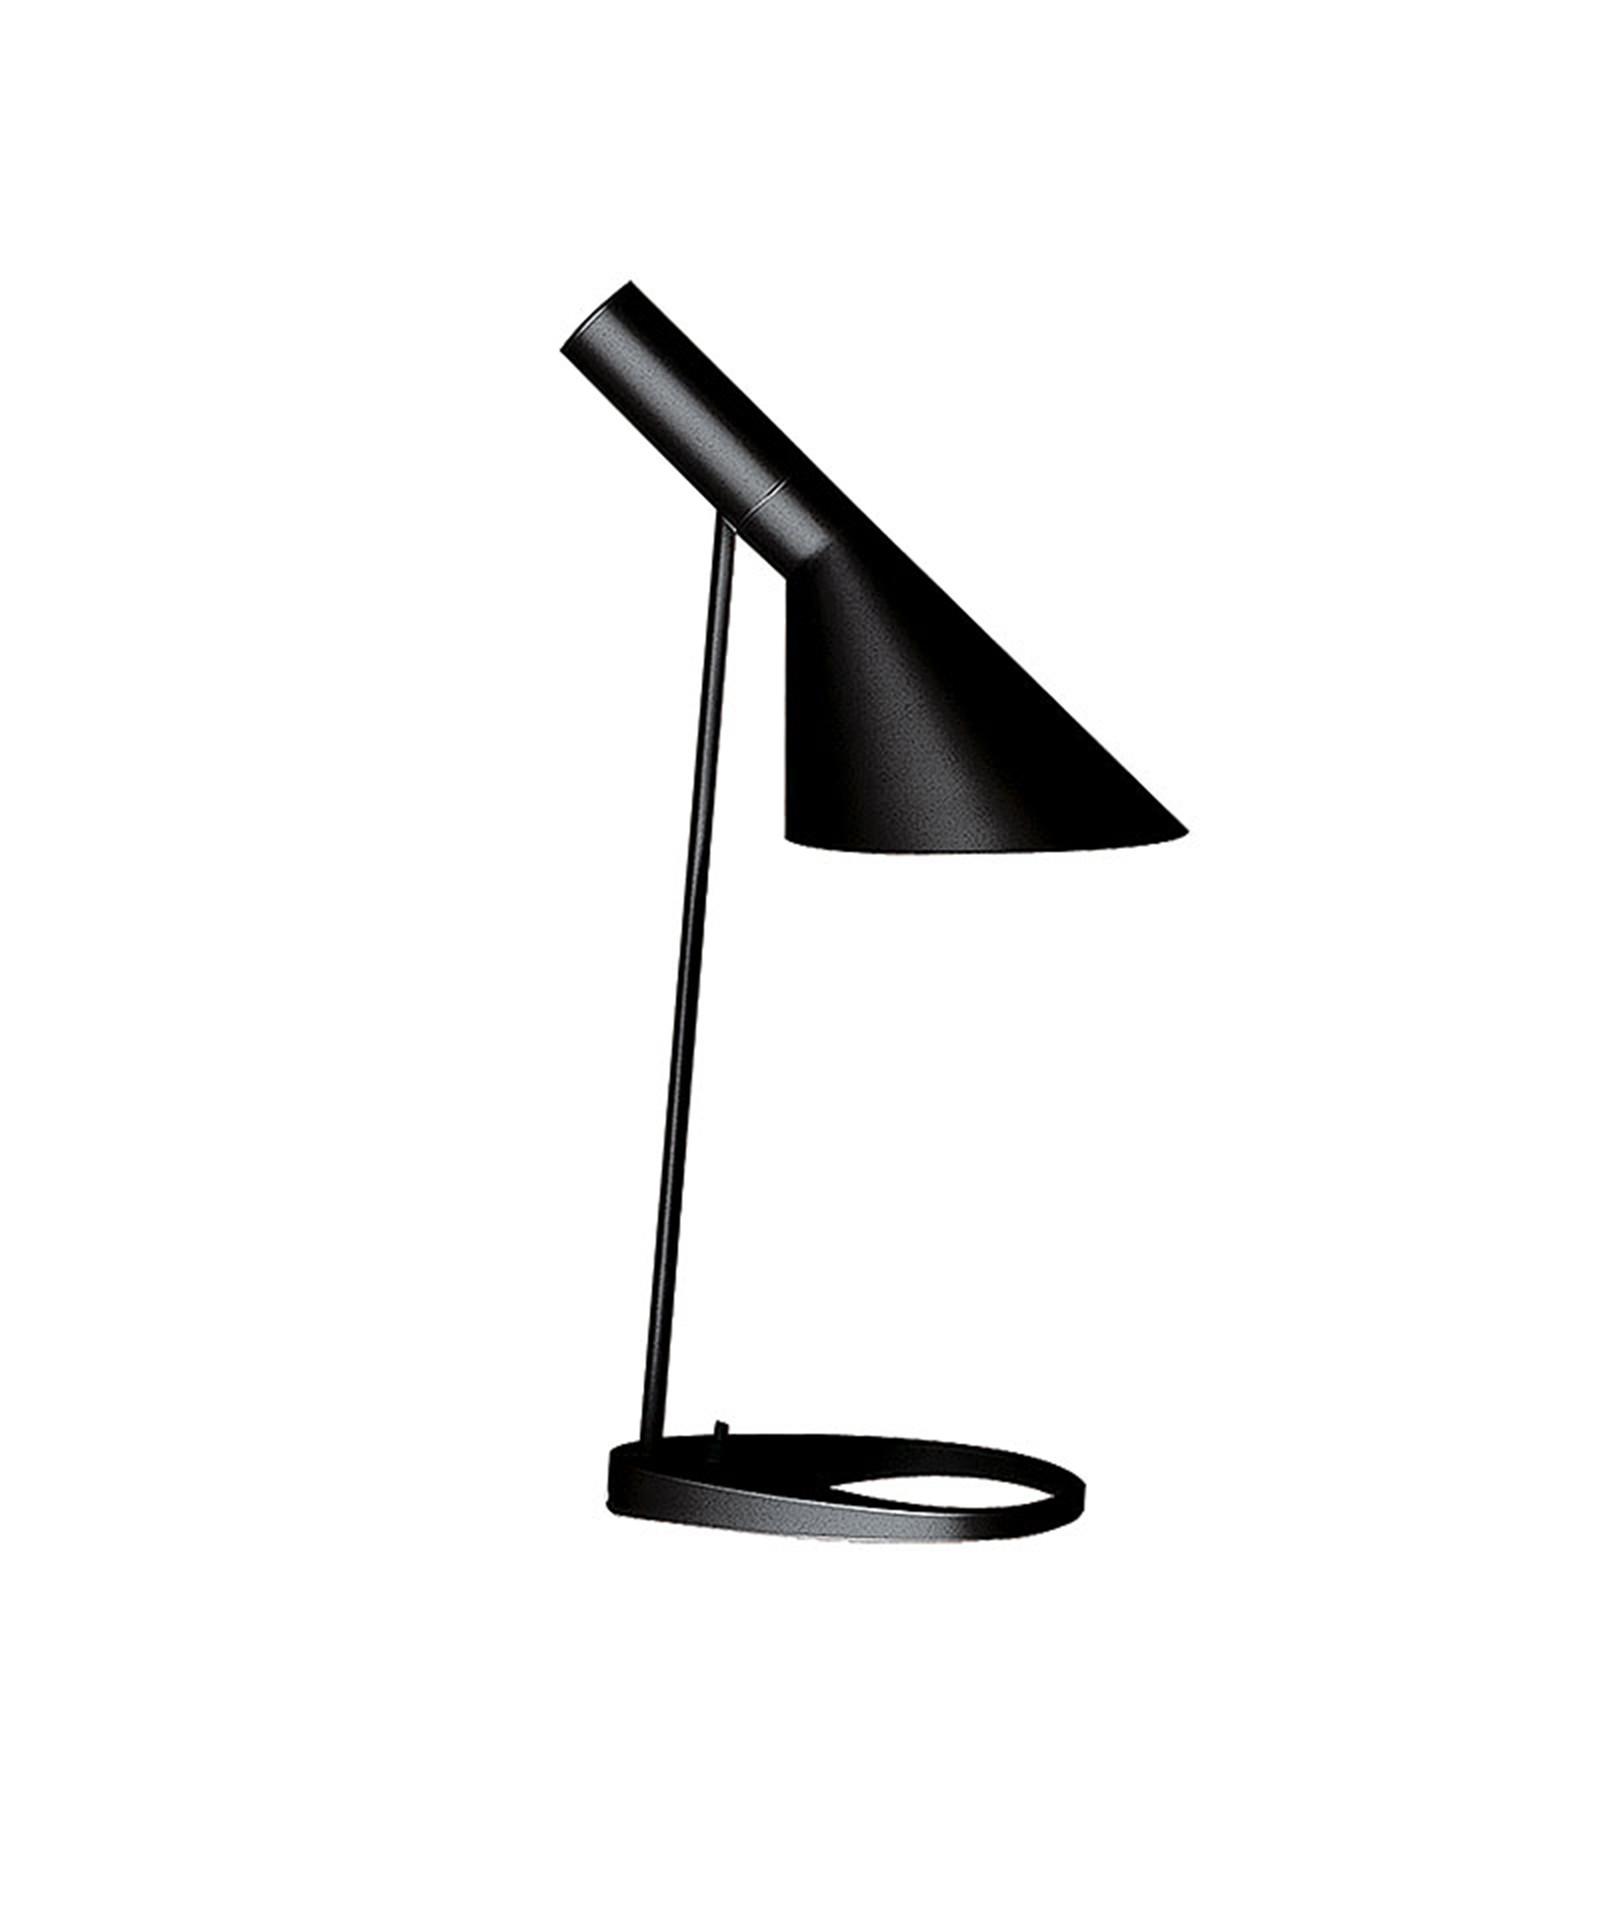 aj bord sort louis poulsen. Black Bedroom Furniture Sets. Home Design Ideas